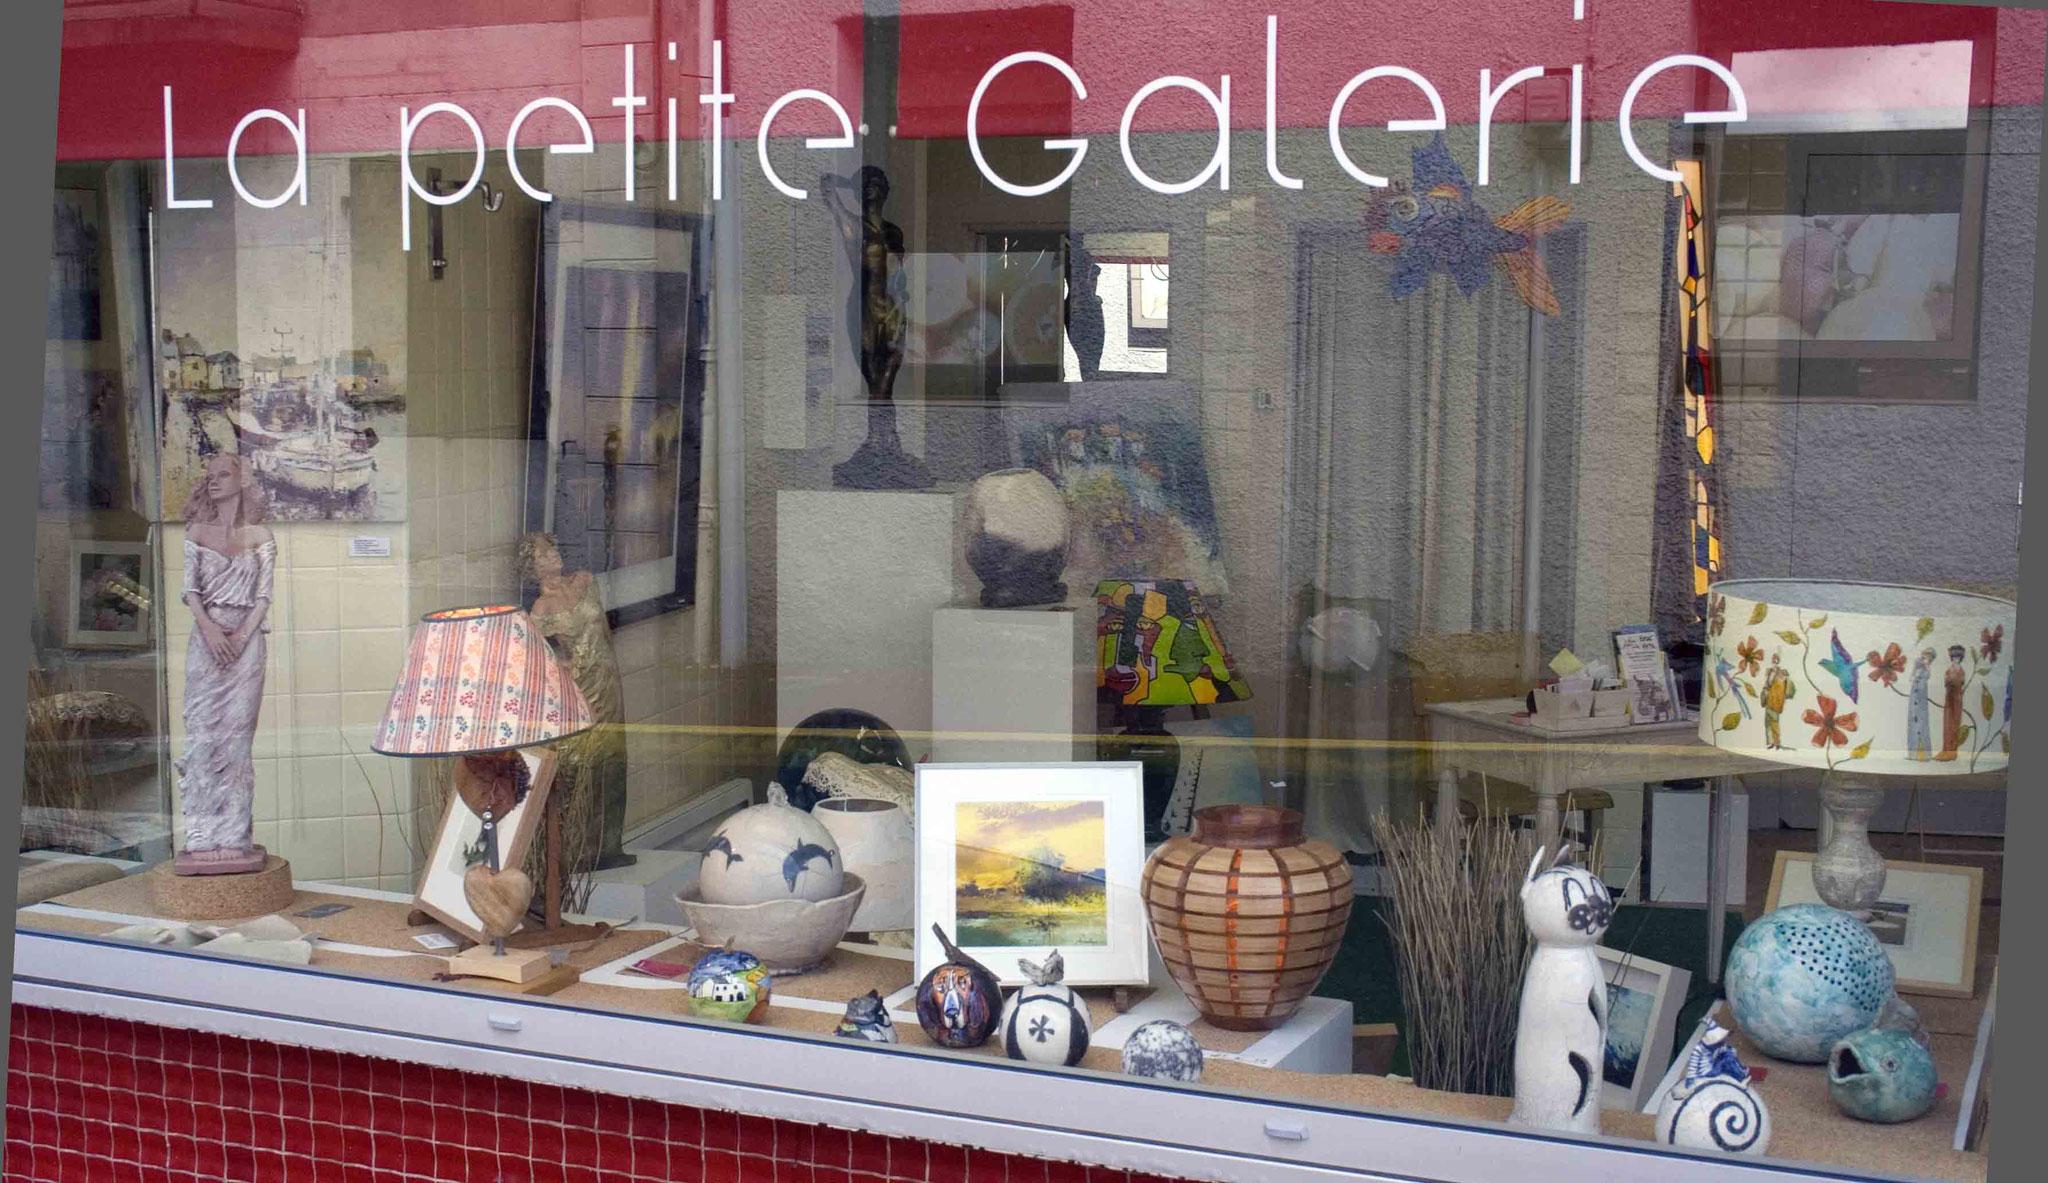 La Petite Galerie - Bas-en-Basset 43210